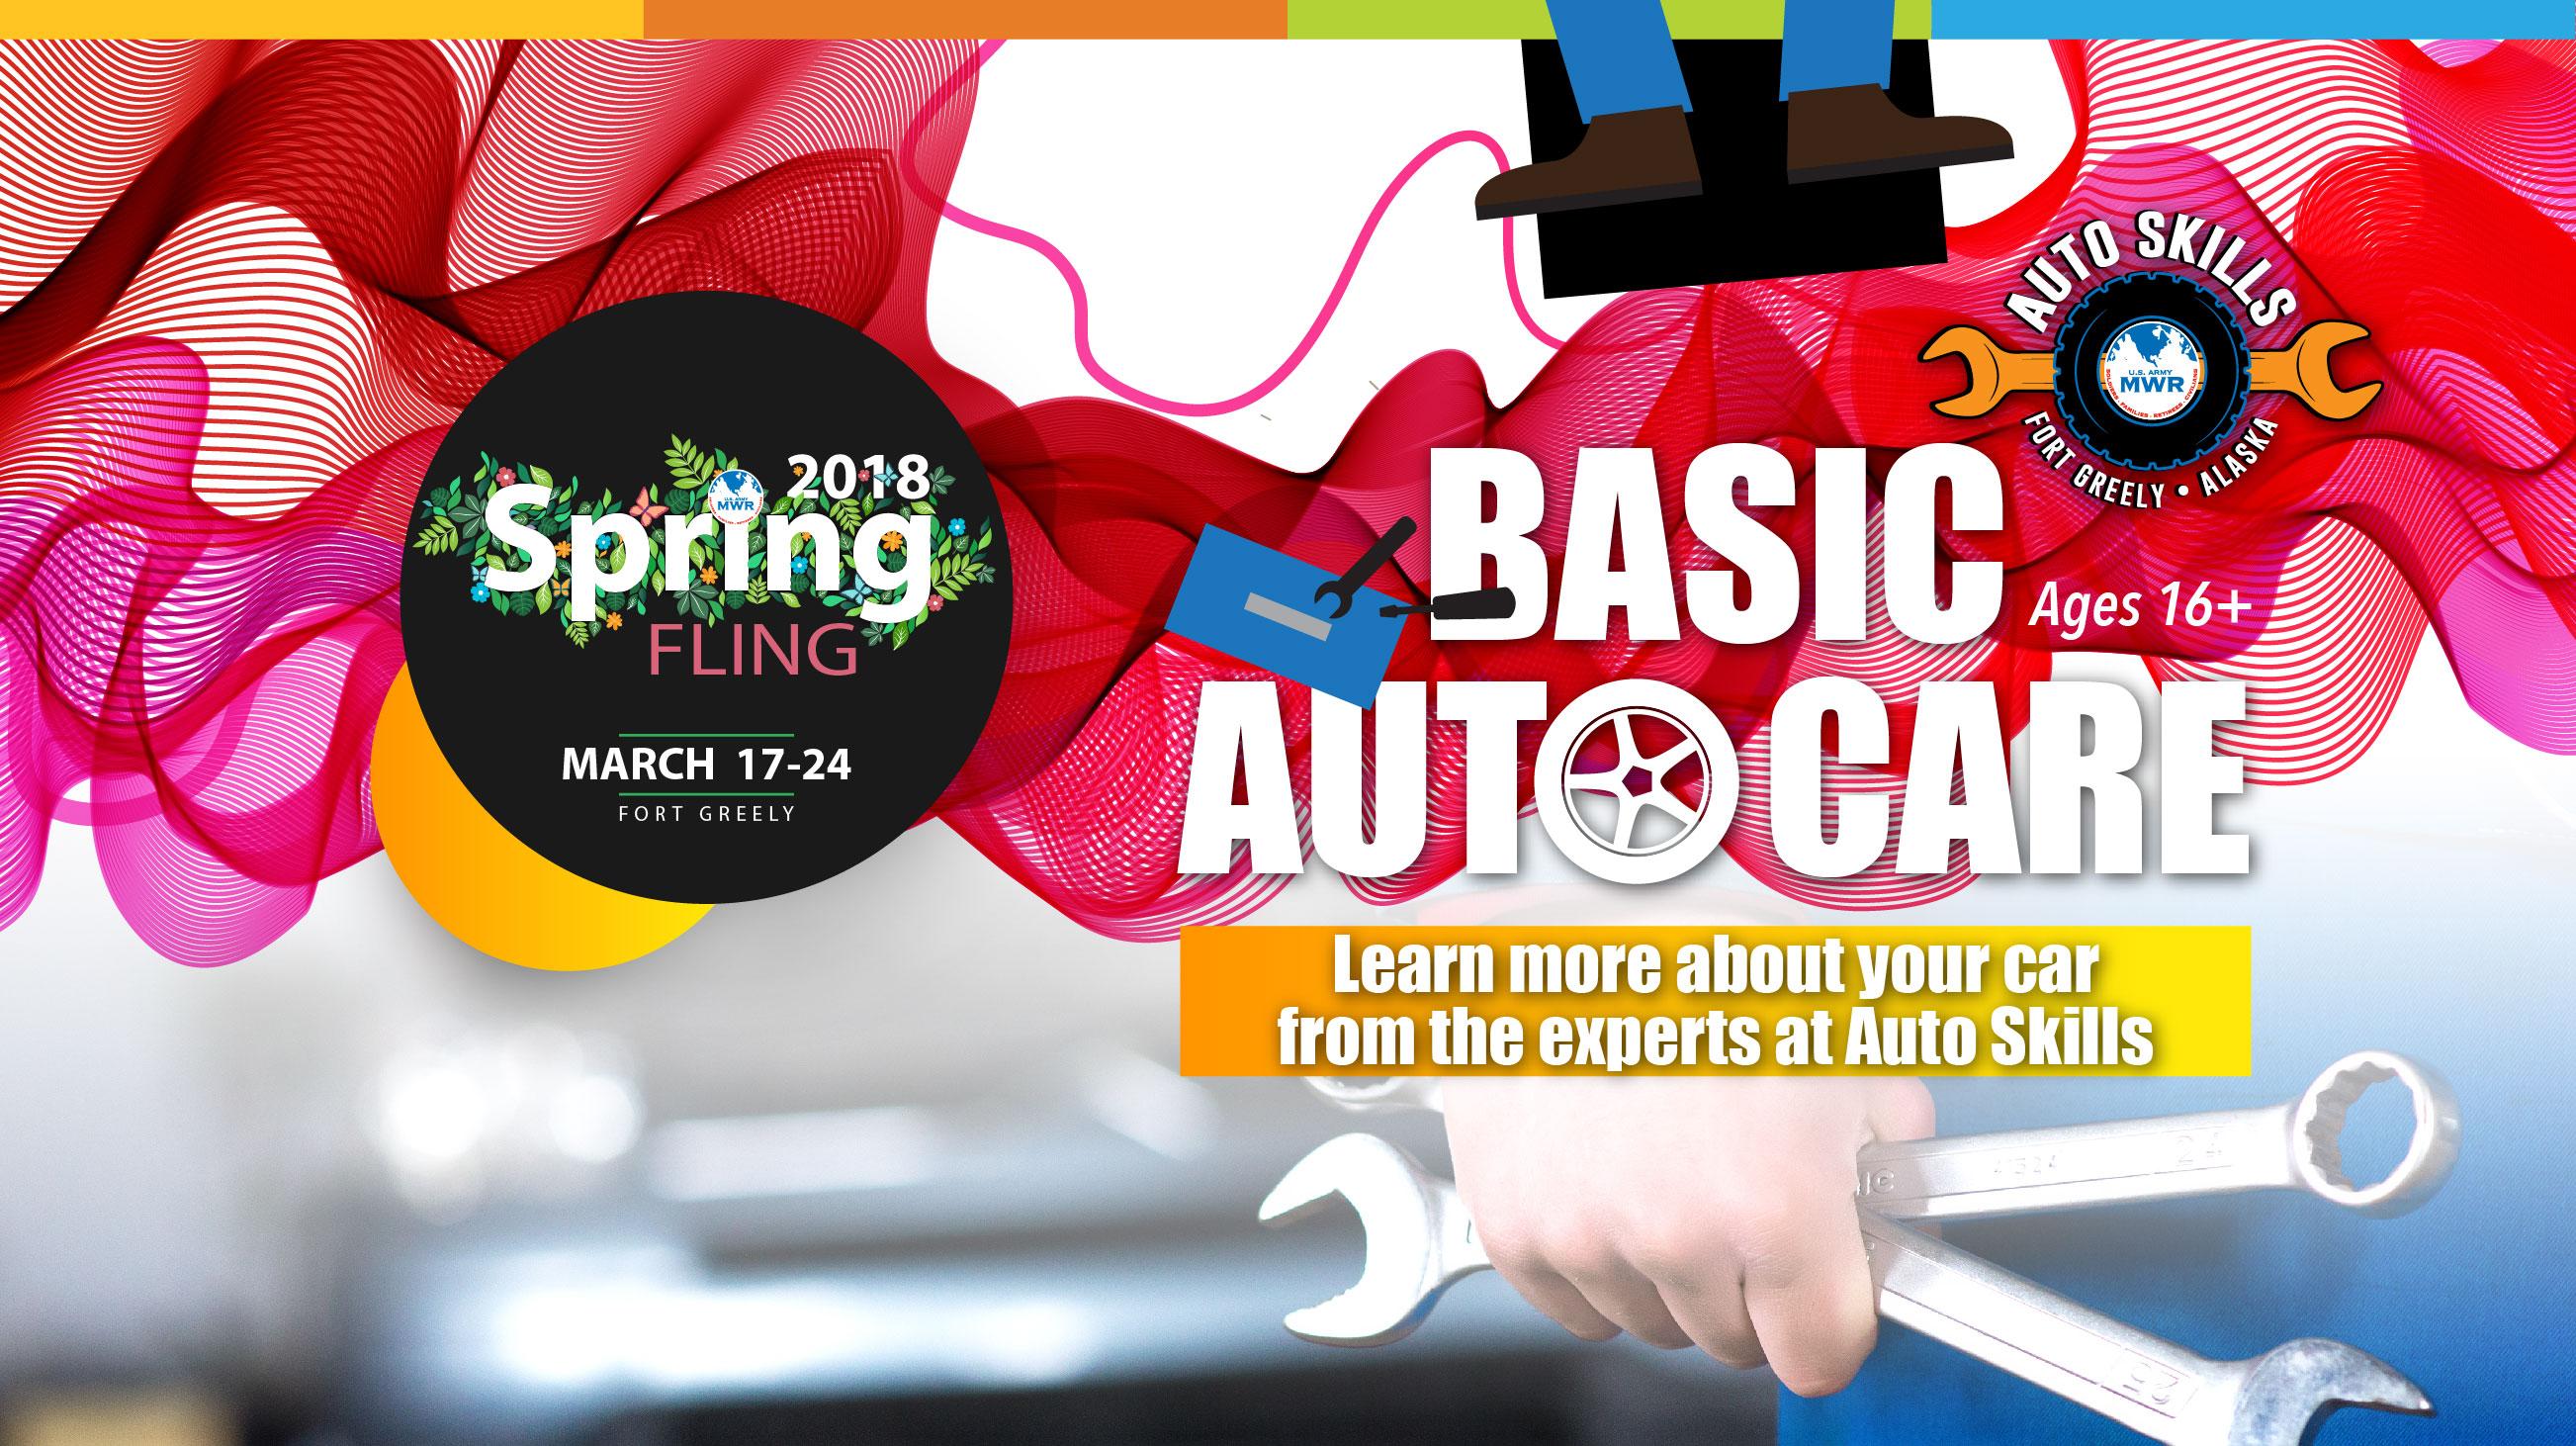 Basic Auto Care Class